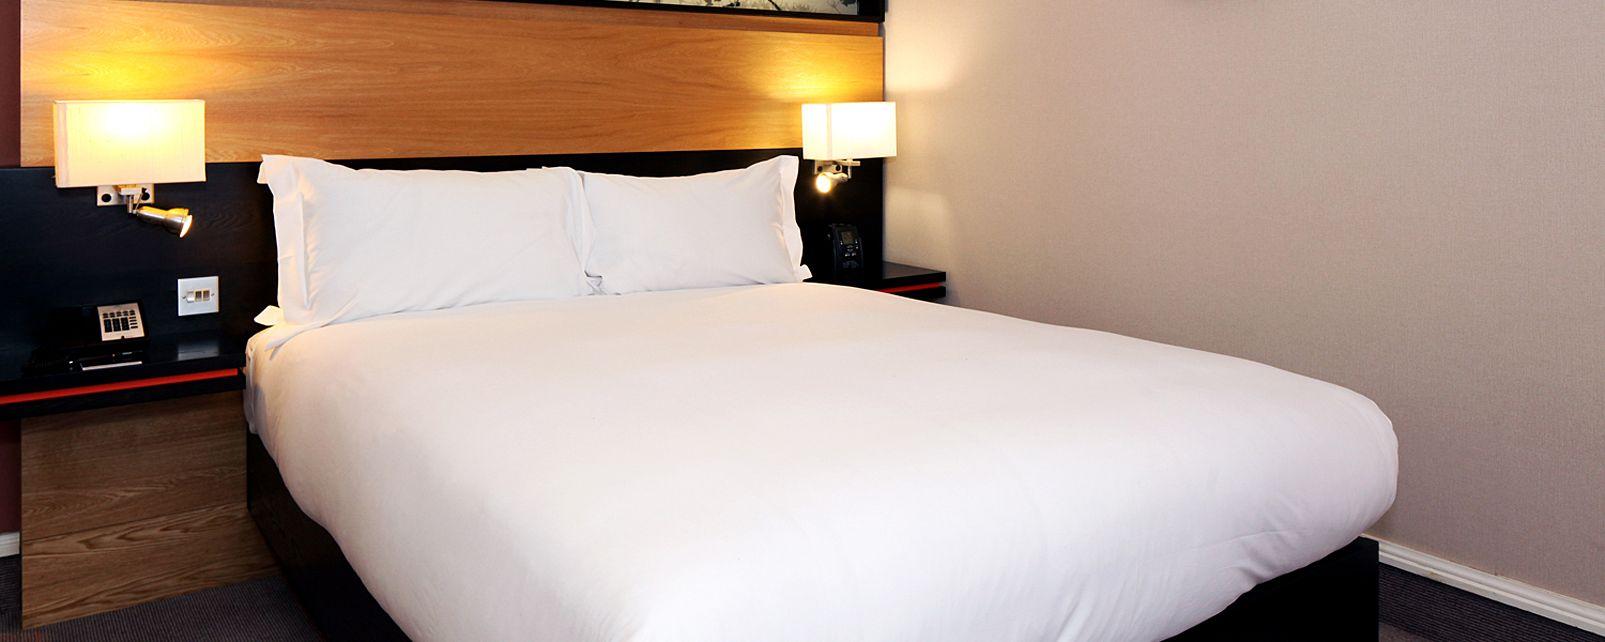 Hôtel Hilton Dublin